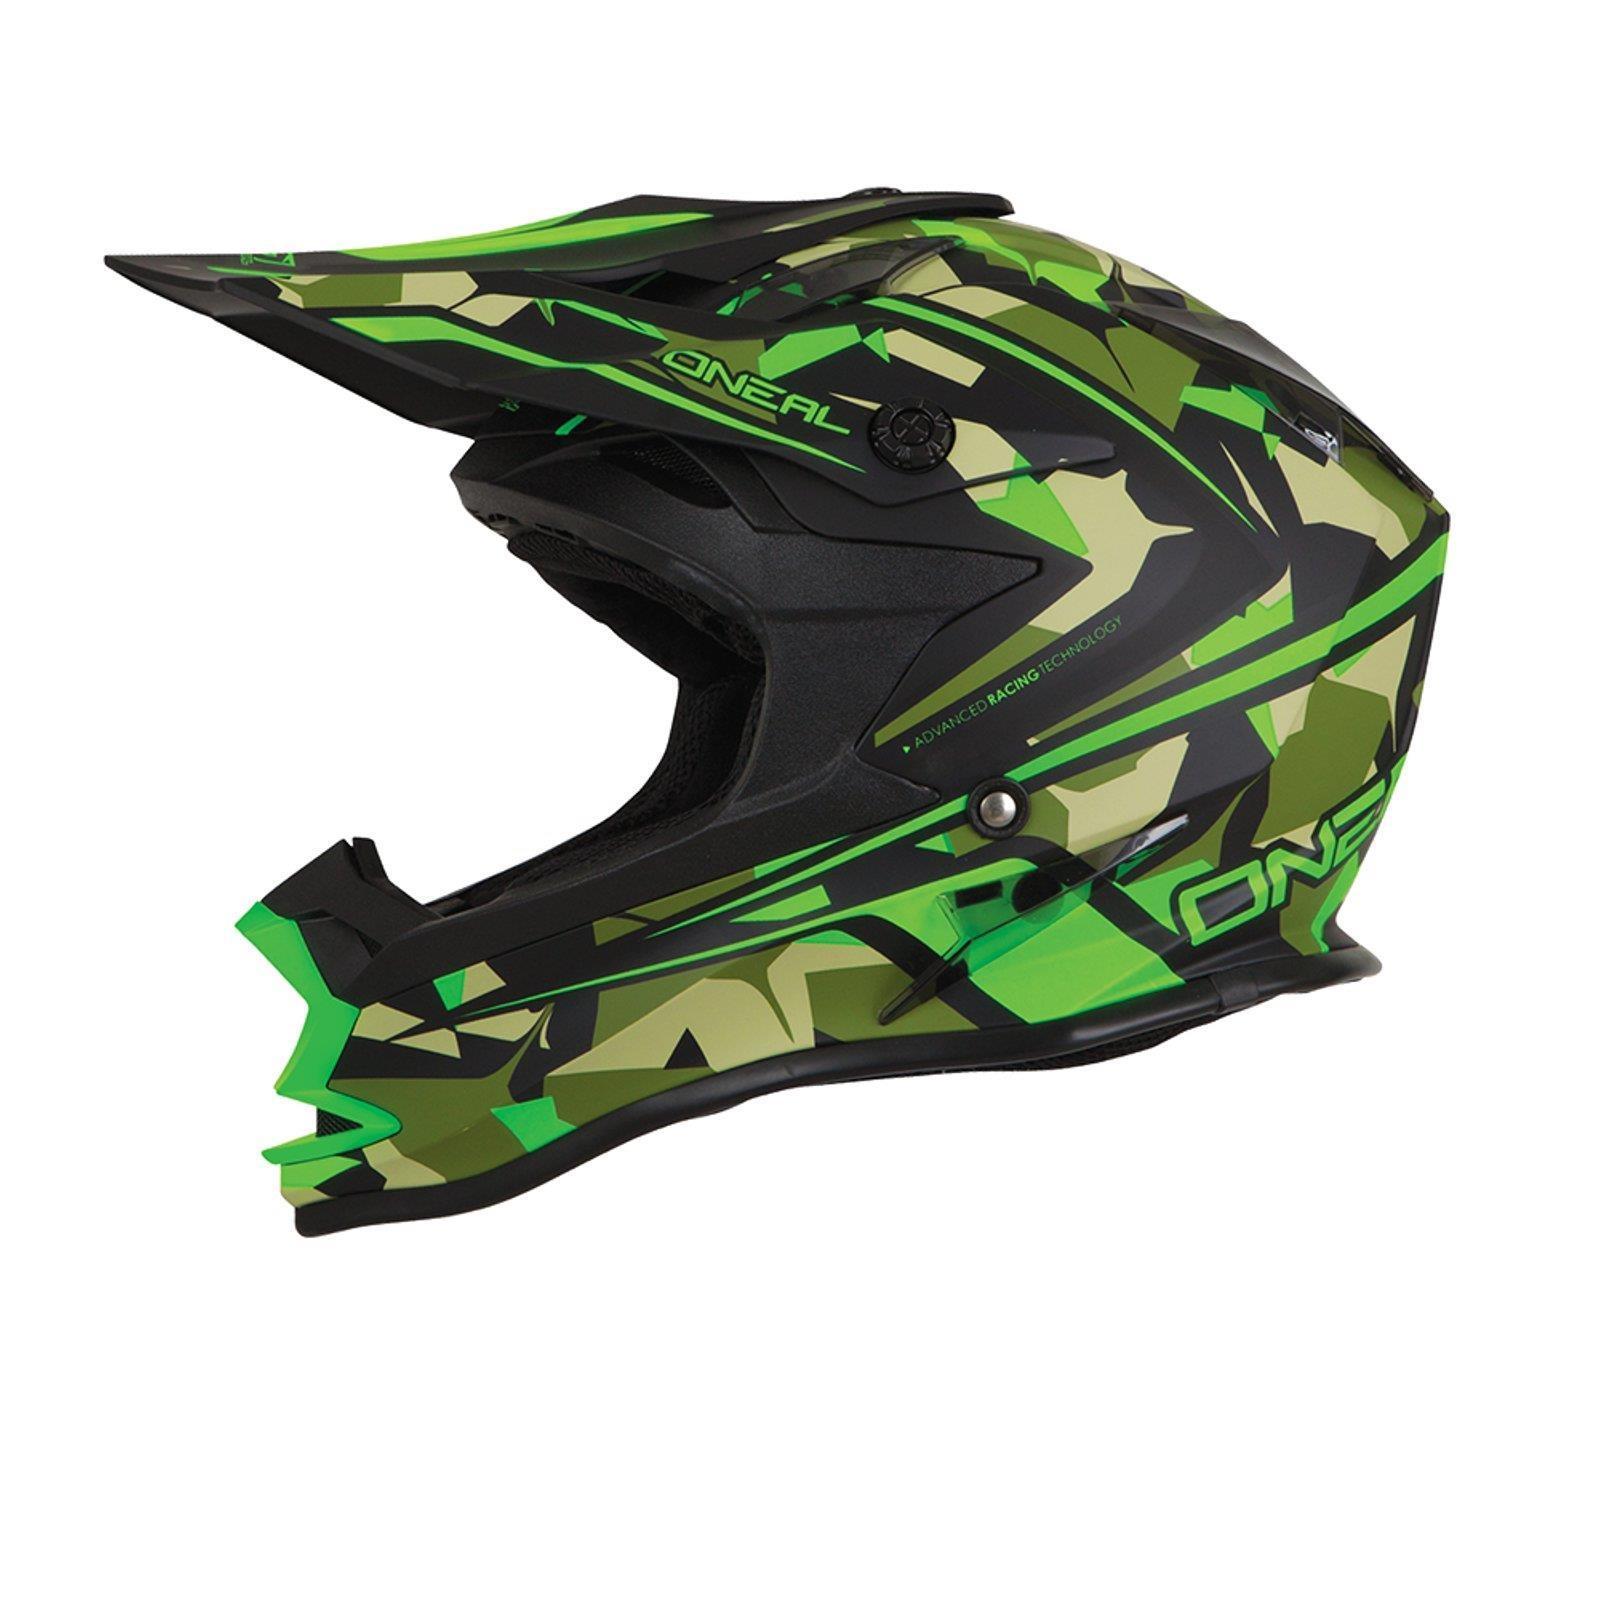 ONeal-Motocross-casco-MX-ENDURO-MOTO-BICI-FUORISTRADA-CROSS-Series-Adventure miniatura 124